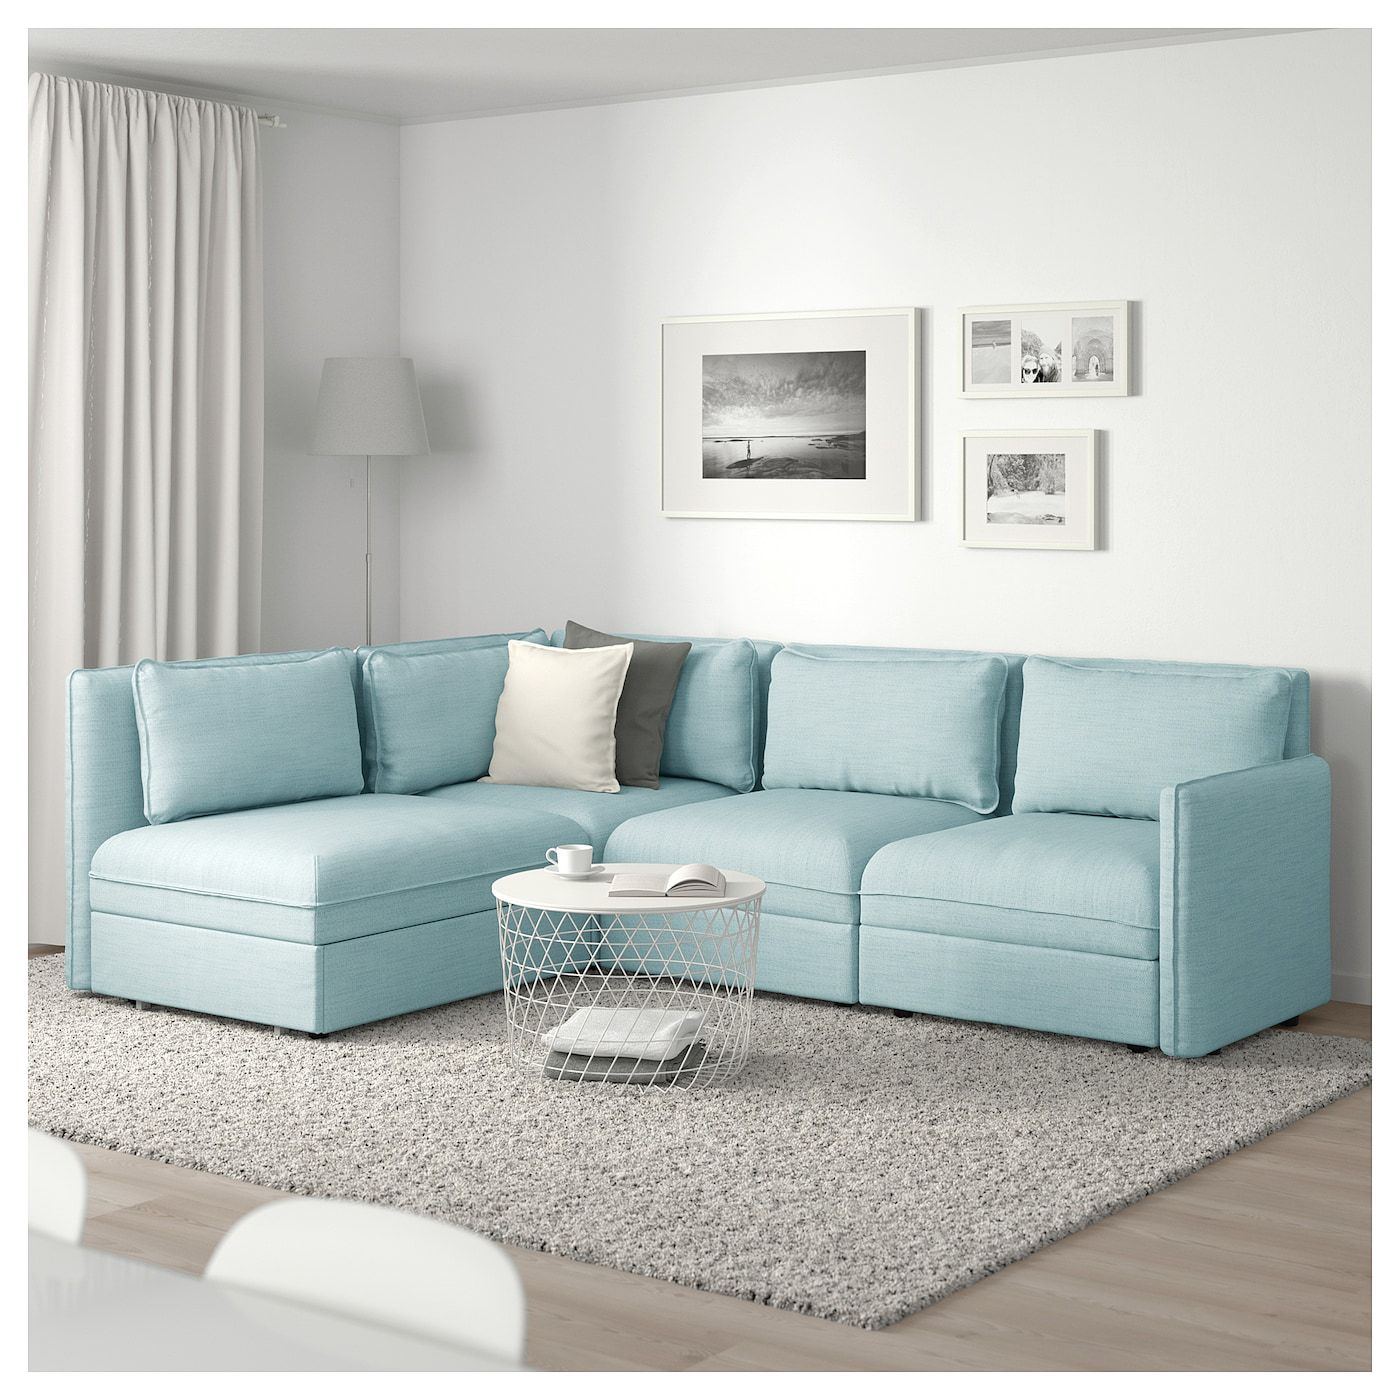 Vallentuna Mod Sectional 3 Seat W Slpr Sect And Storage Hillared Light Blue Ikea Modular Corner Sofa Corner Sofa Vallentuna